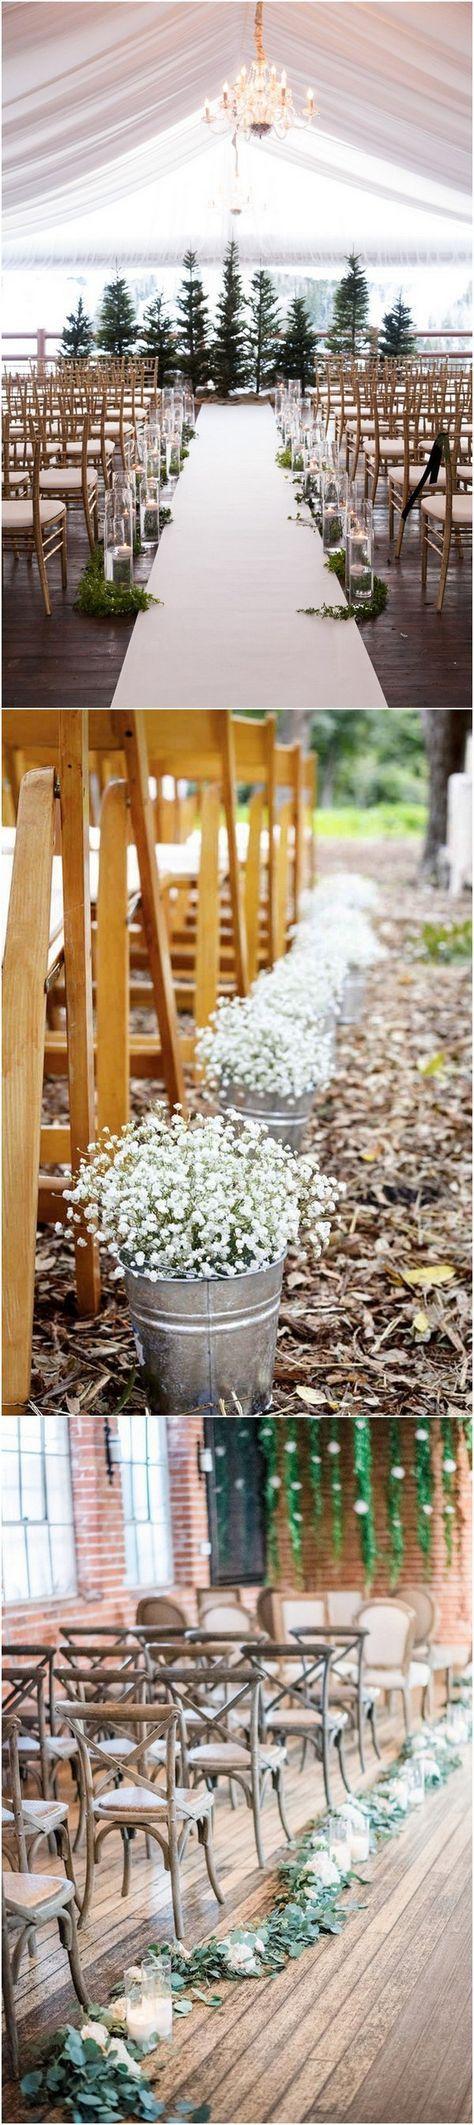 20 Breathtaking Wedding Aisle Decoration Ideas to Steal ...